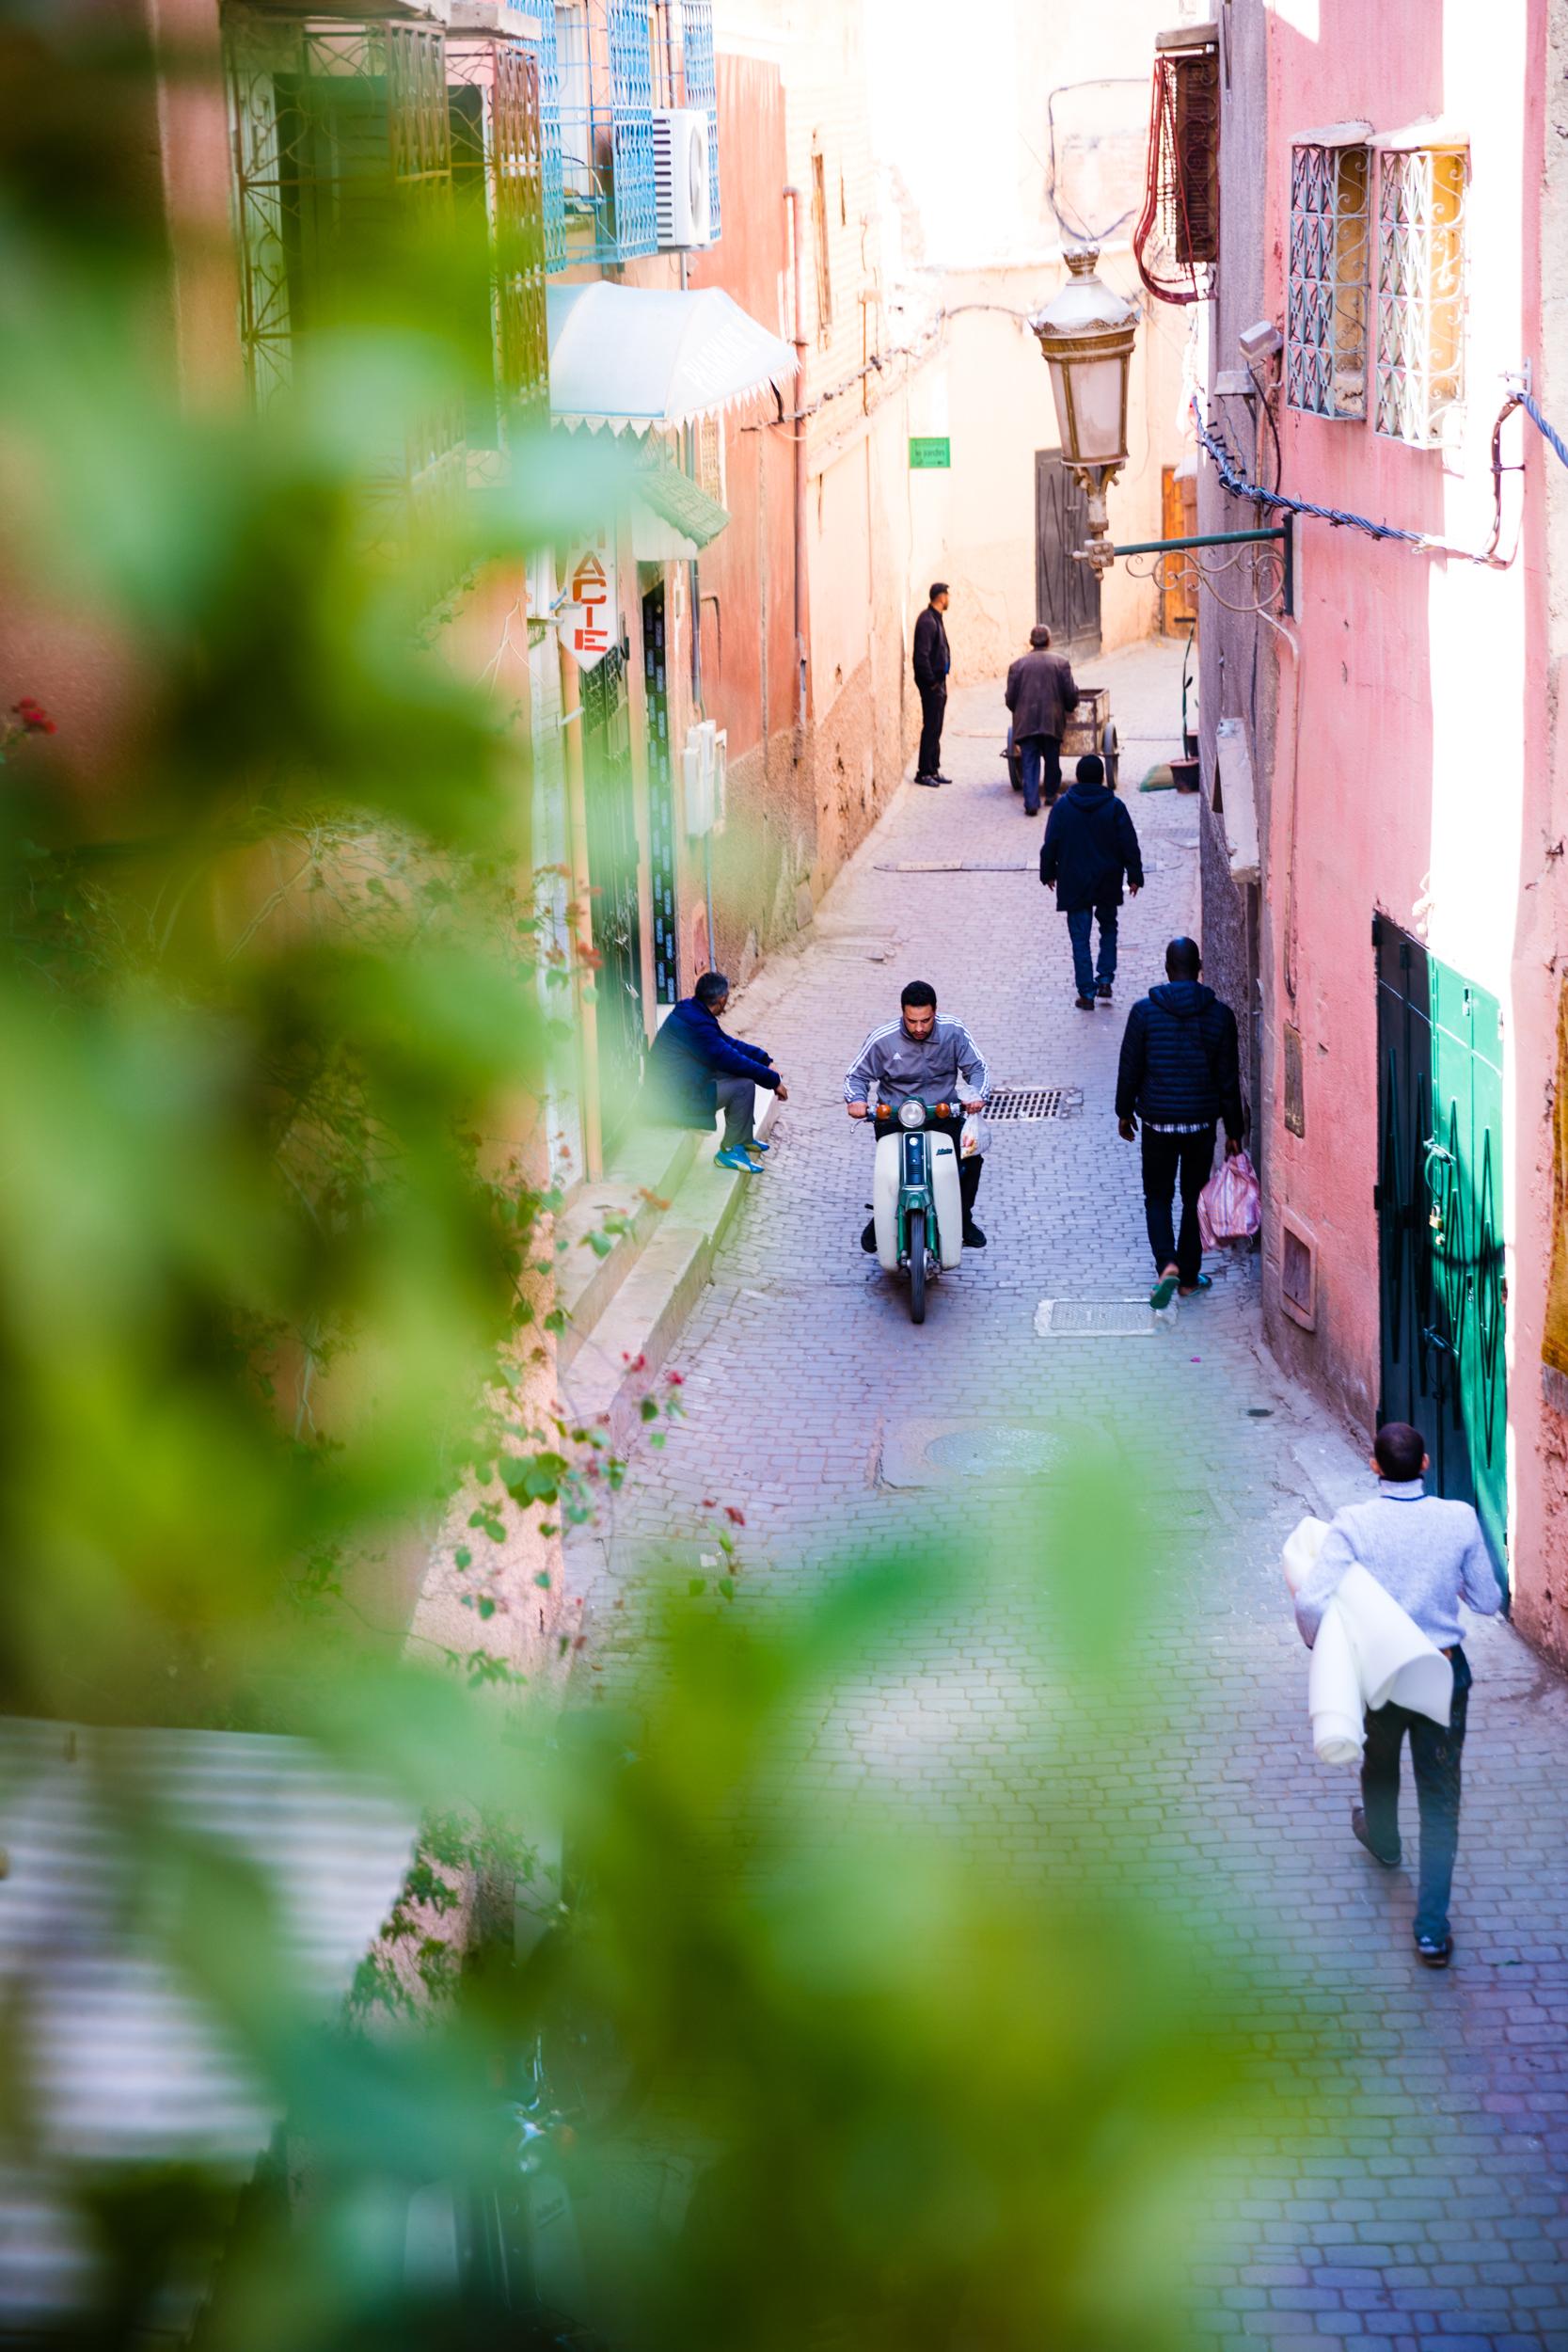 Colin_Herrington_Maroc_Stories-16.jpg